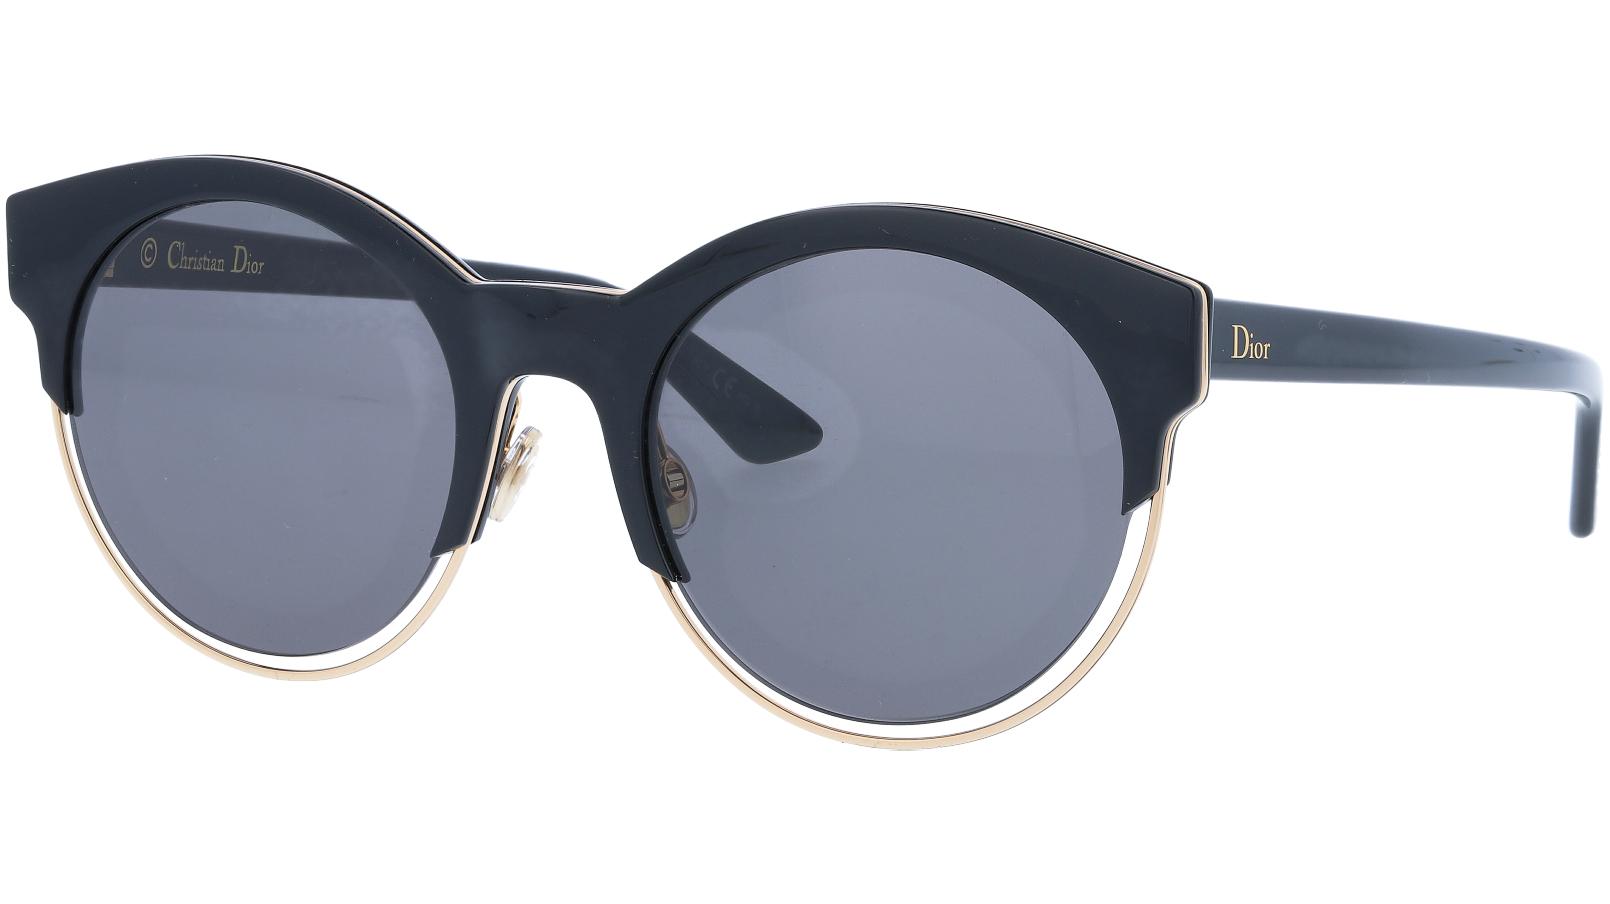 Dior SIDERAL1 J6CKU 53 Blue Sunglasses